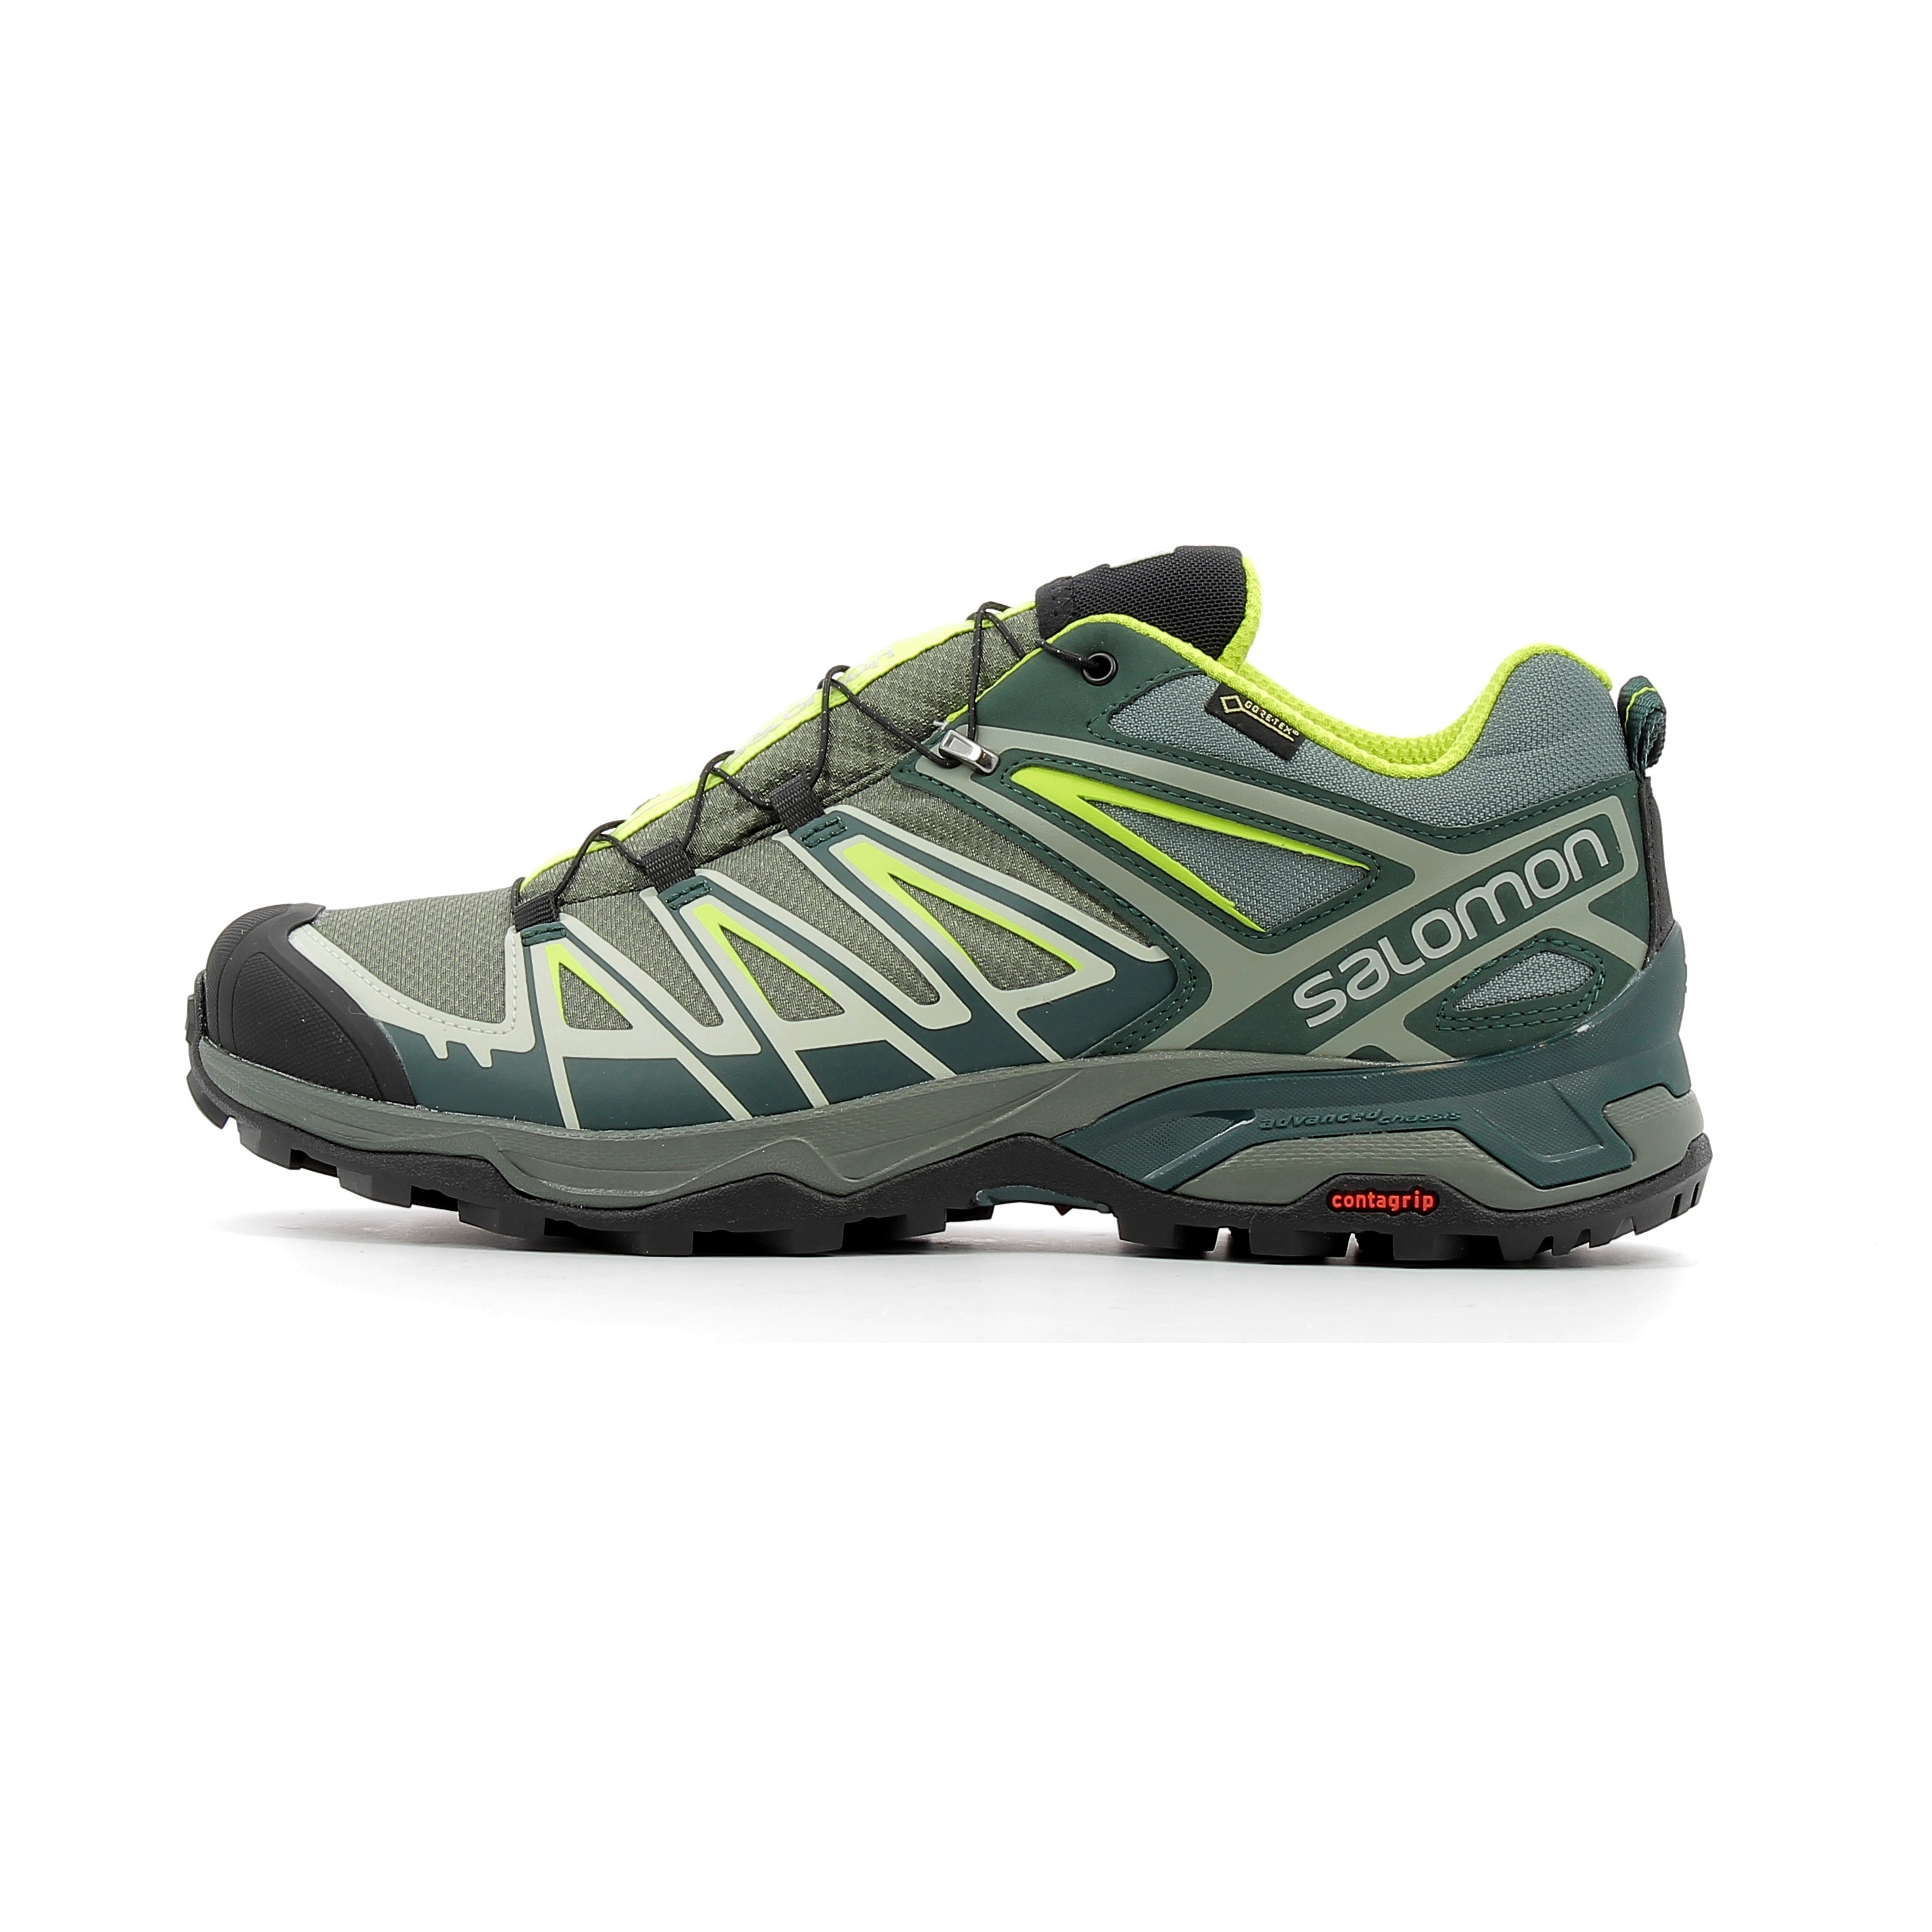 salomon x ultra 3 low gtx hiking shoes australia nike